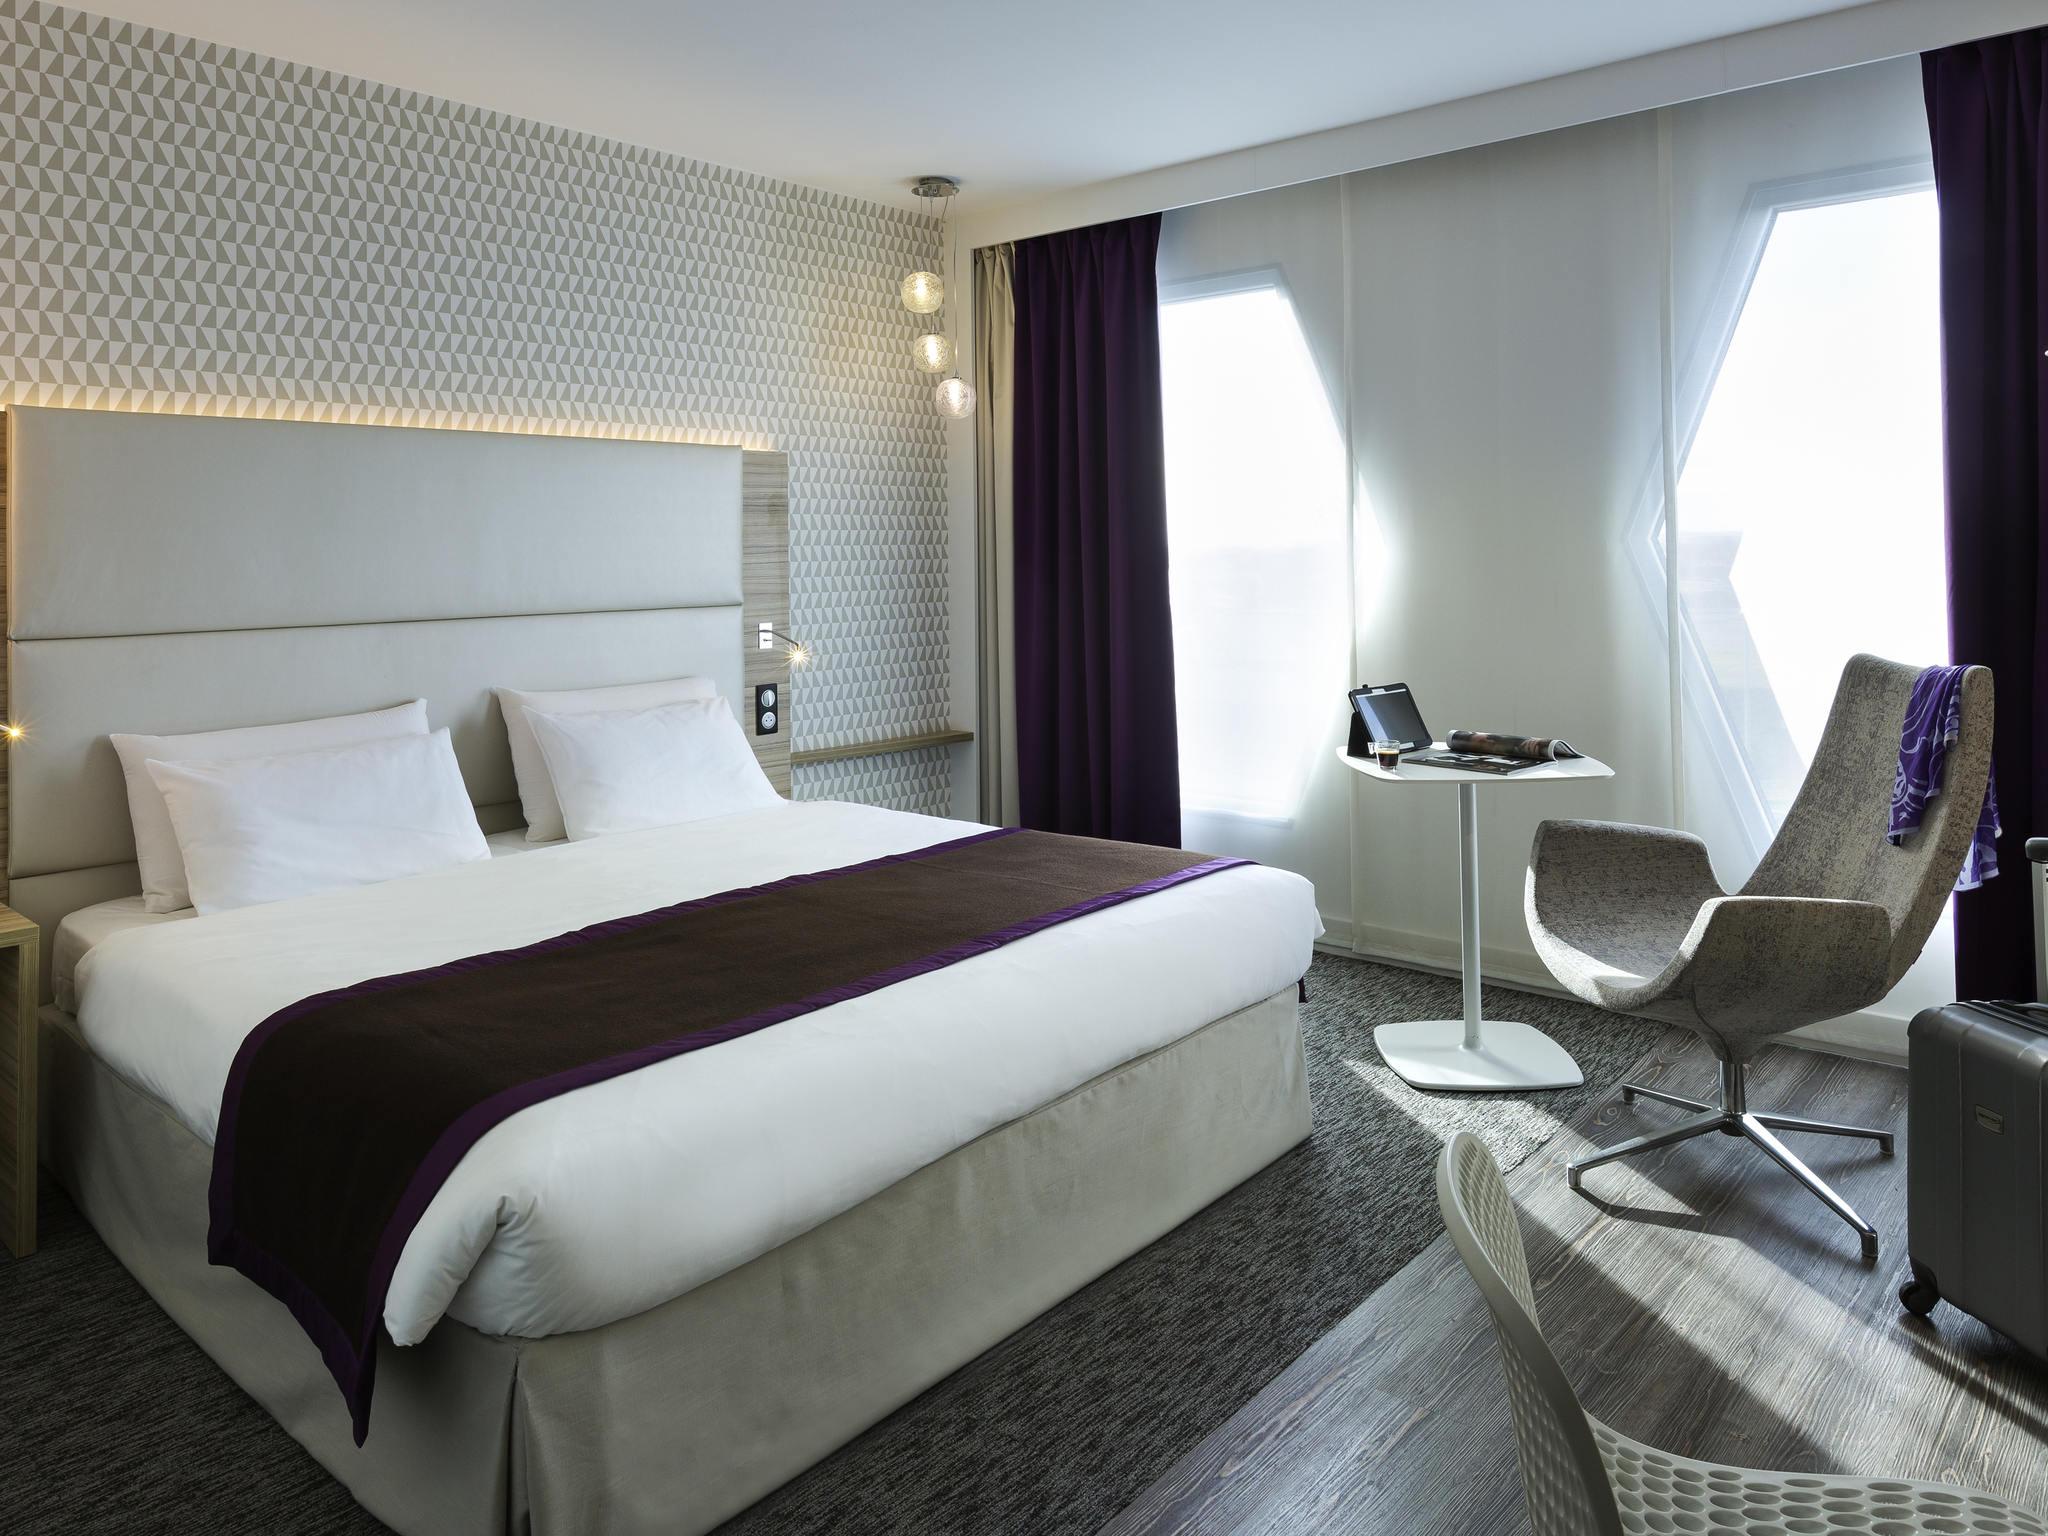 Hotel - Mercure Paris Orly Rungis Aéroport Hotel